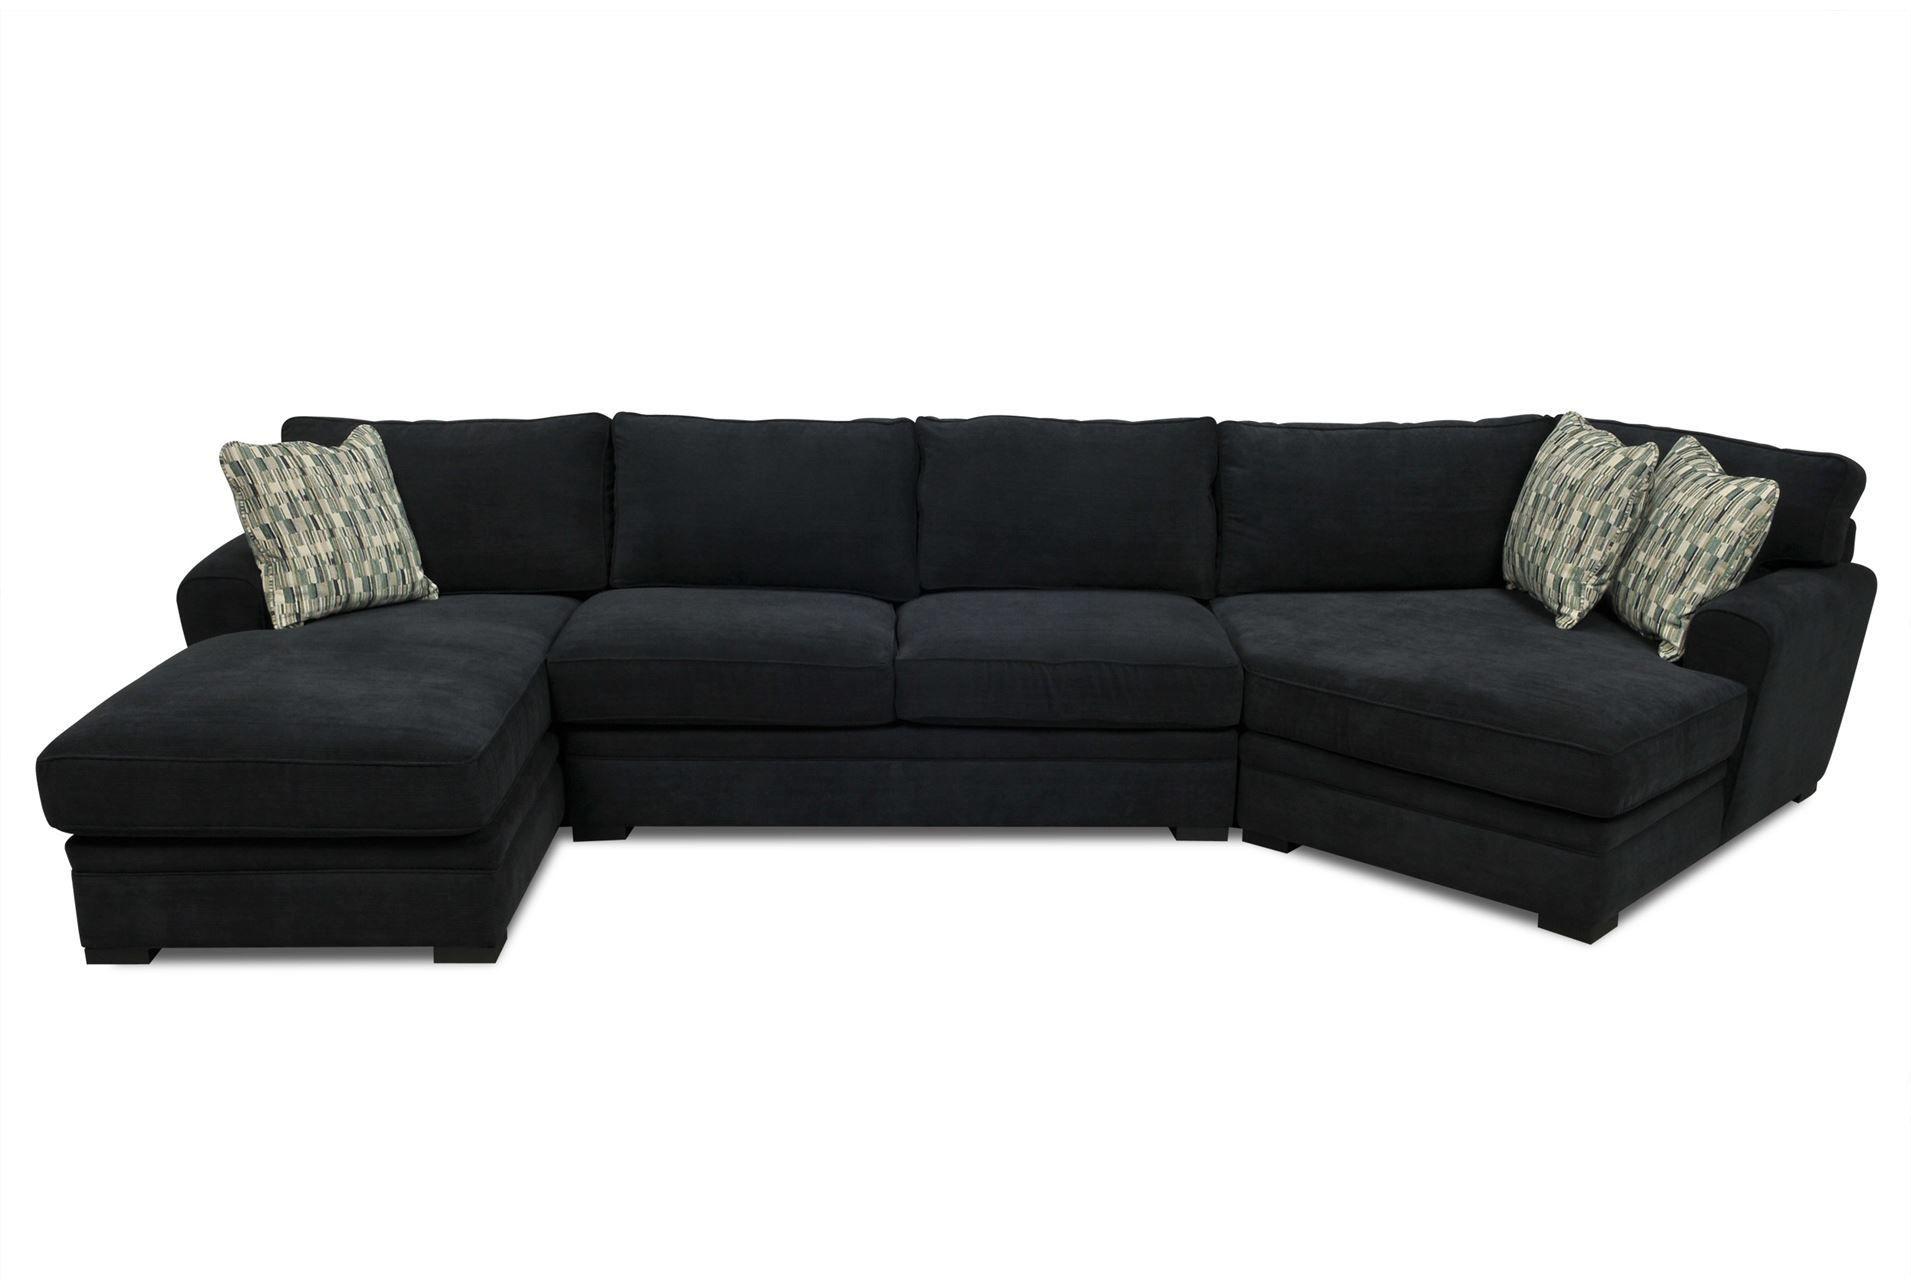 Furniture Furniture, U Shaped Suede Sectional Sofa In Brown ...